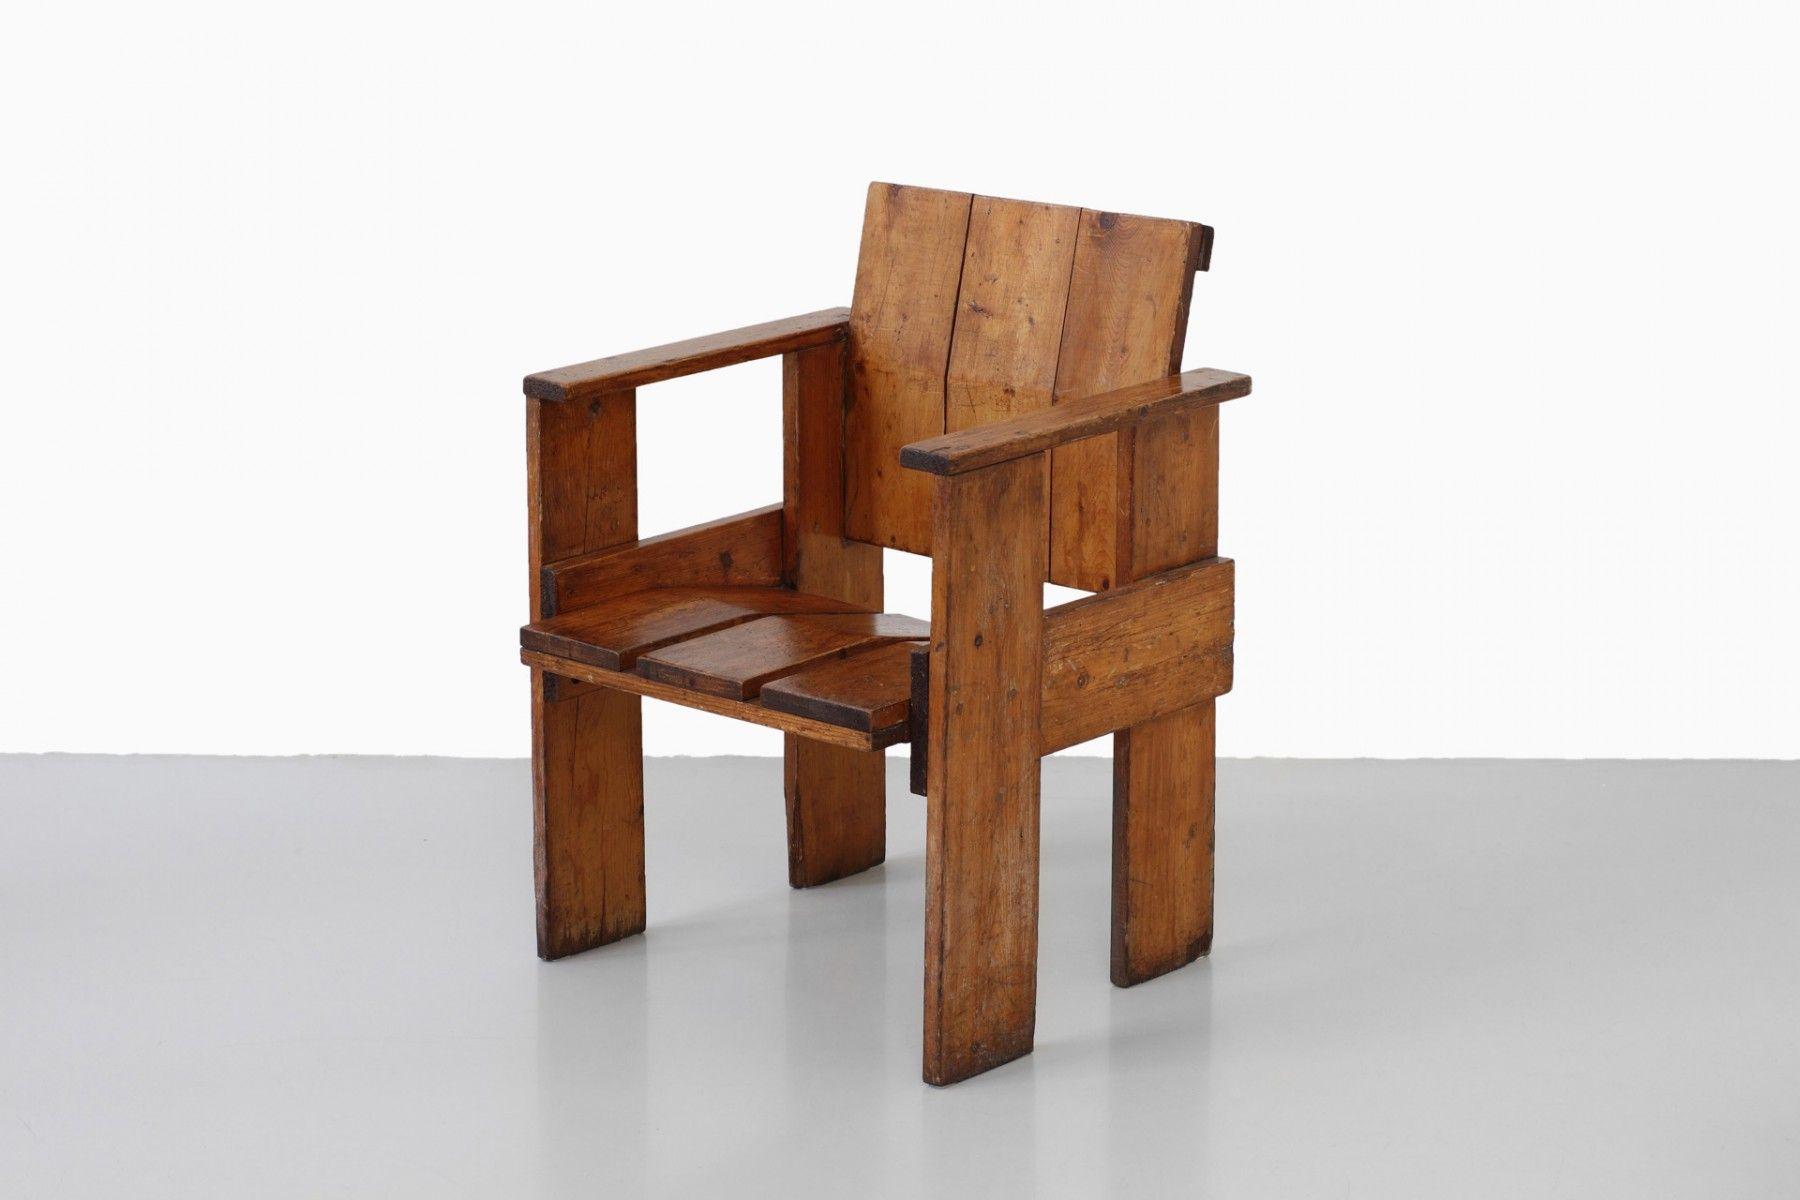 Gerrit Rietveld Kratstoel : Albatros chair by gerrit rietveld the exceptional bungalow and